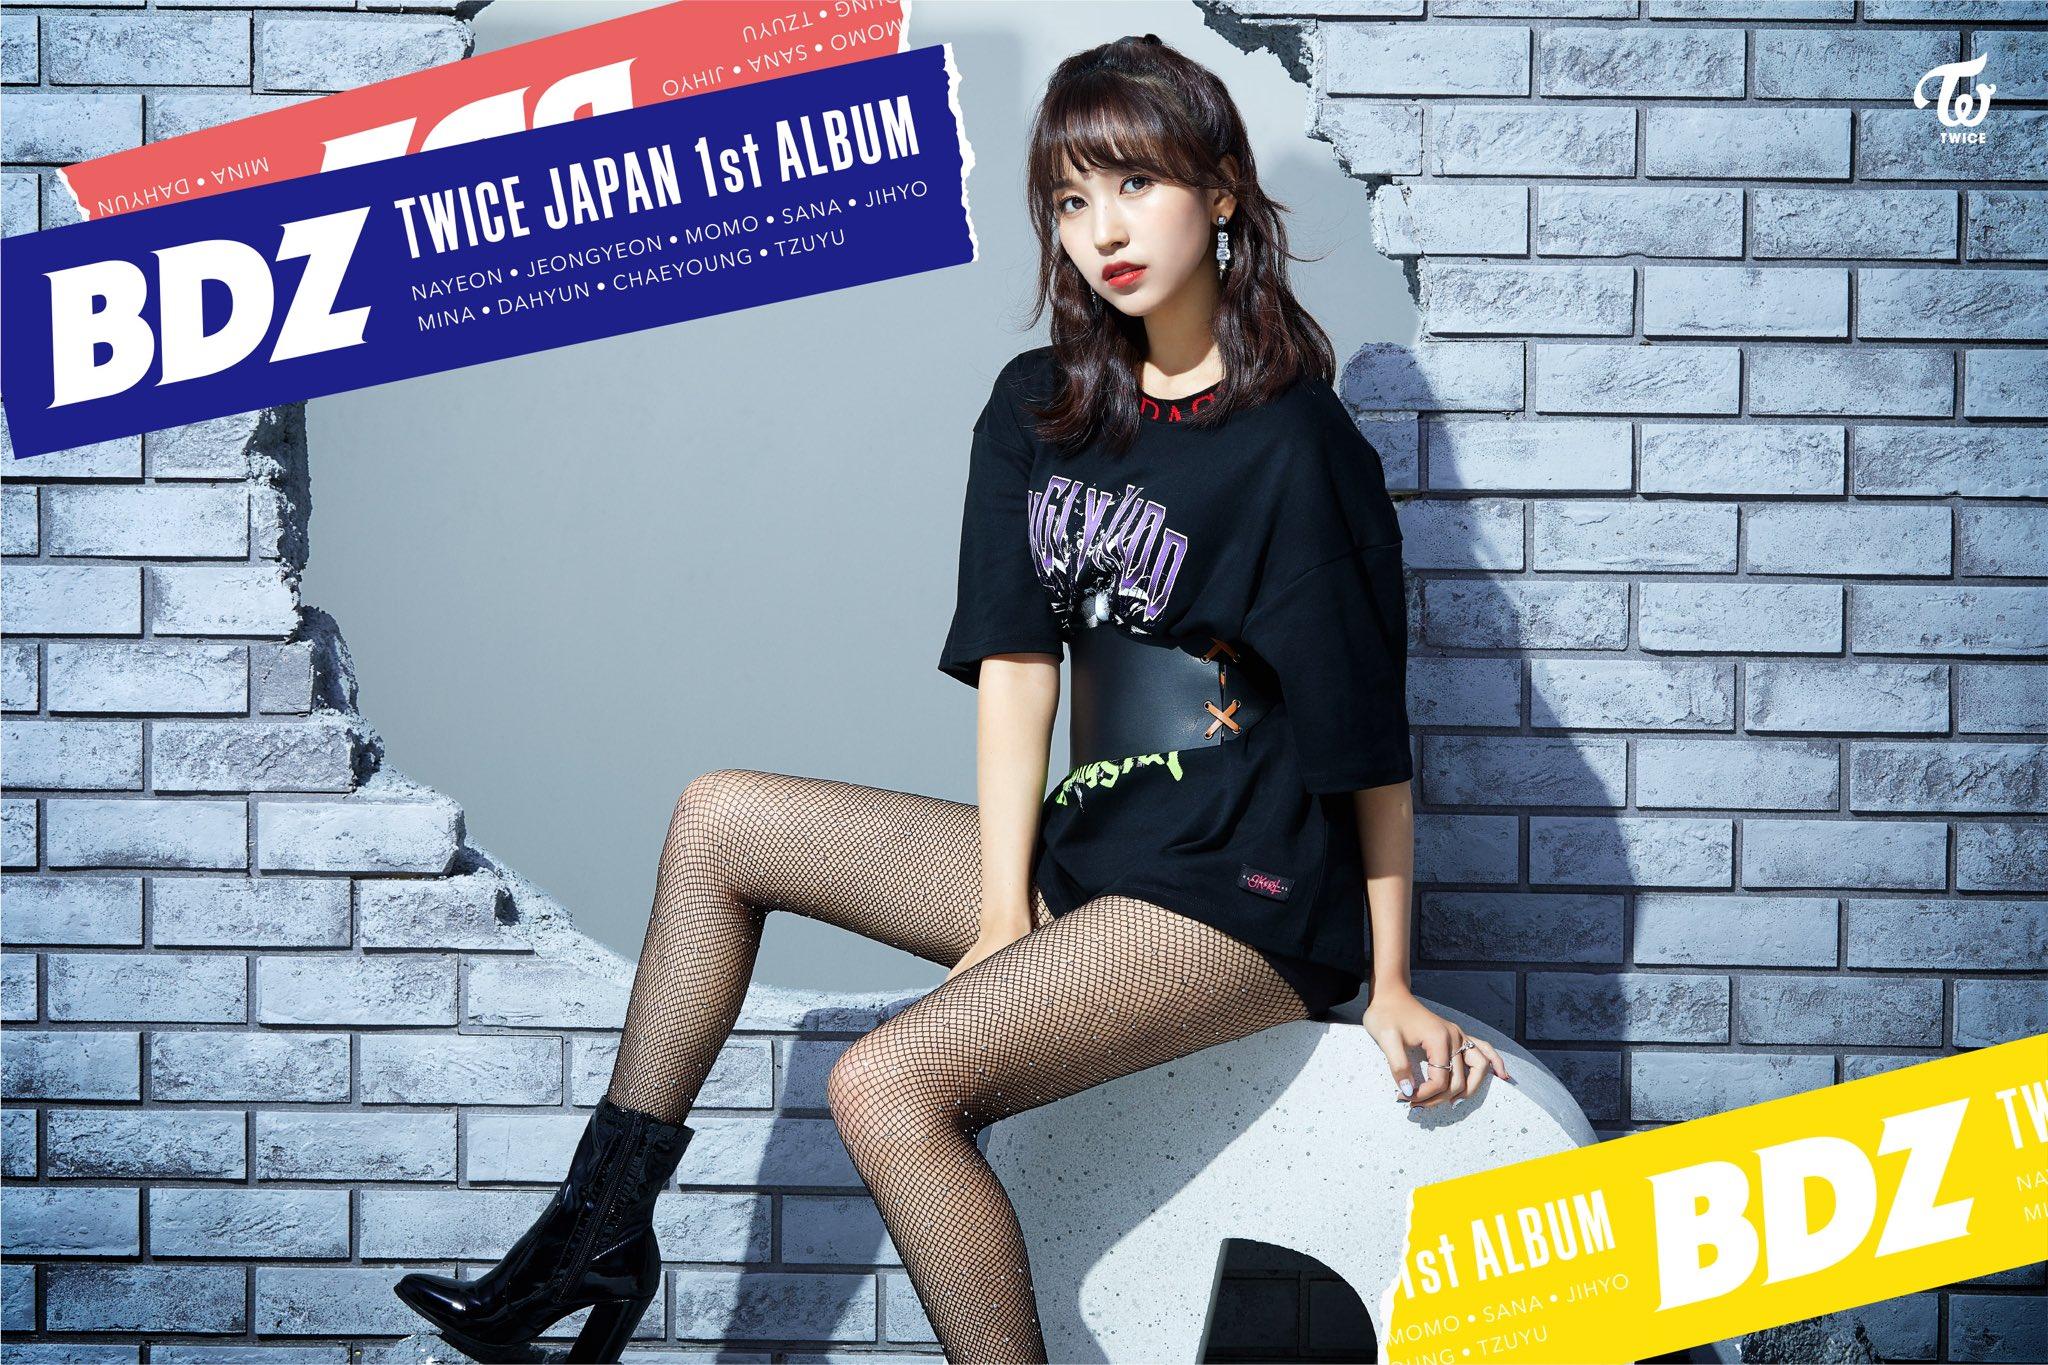 TWICE JAPAN 1st ALBUM『BDZ』  2018.09.12 Release  MINA  https://t.co/U5Bn1KOa1k  #TWICE #BDZ https://t.co/A9EhlgTUNF